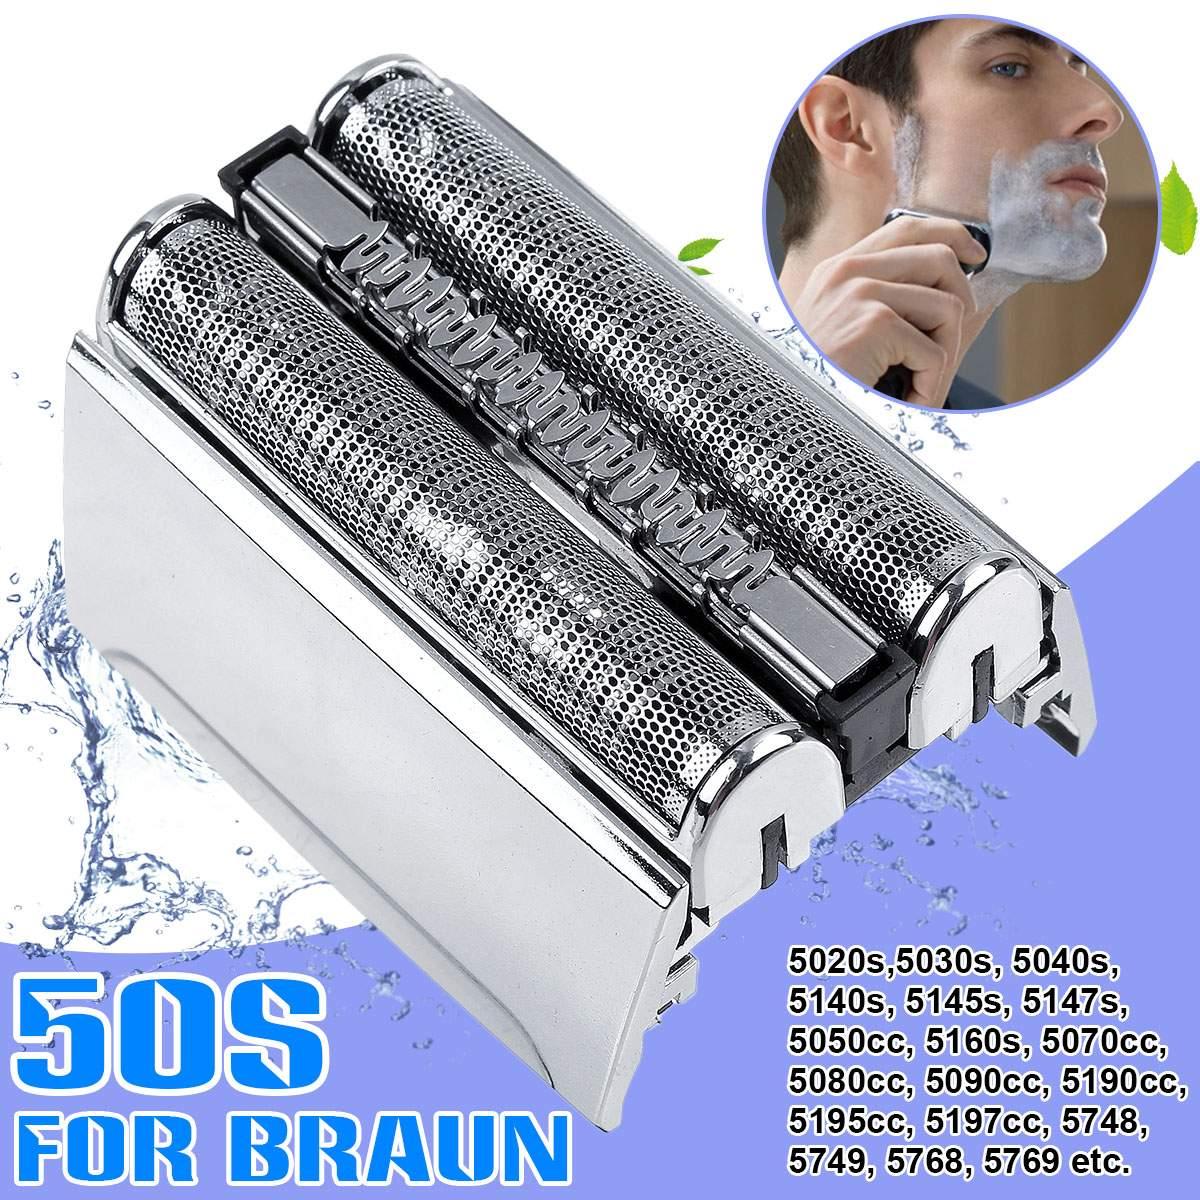 Reemplazo de 52S máquina de papel de cartucho para casete la cabeza para Braun 52S serie 5 5030s 5145 5190cc 5195cc 5197cc 5748, 5749, 5768, 5769